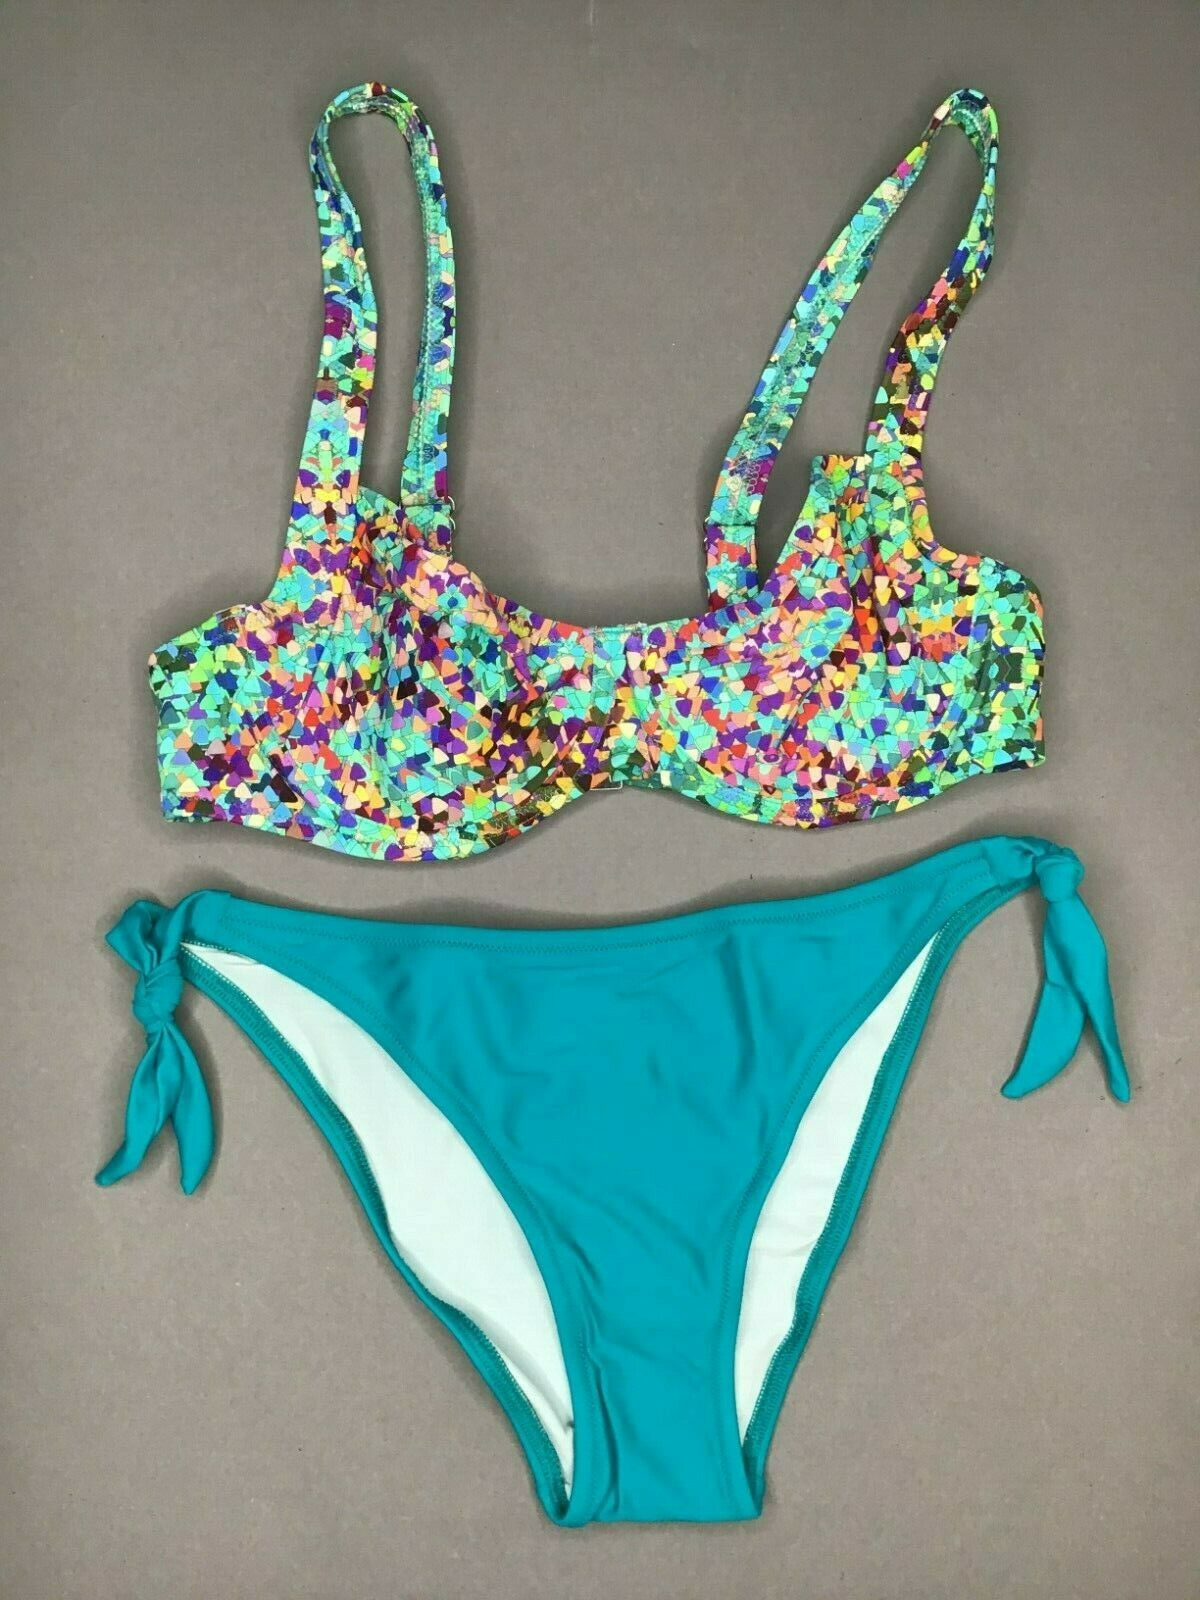 Jolidon Womens Bikini Set FS2172 ungepolstert UNDERWIRED MULTI-COLOURED NEW